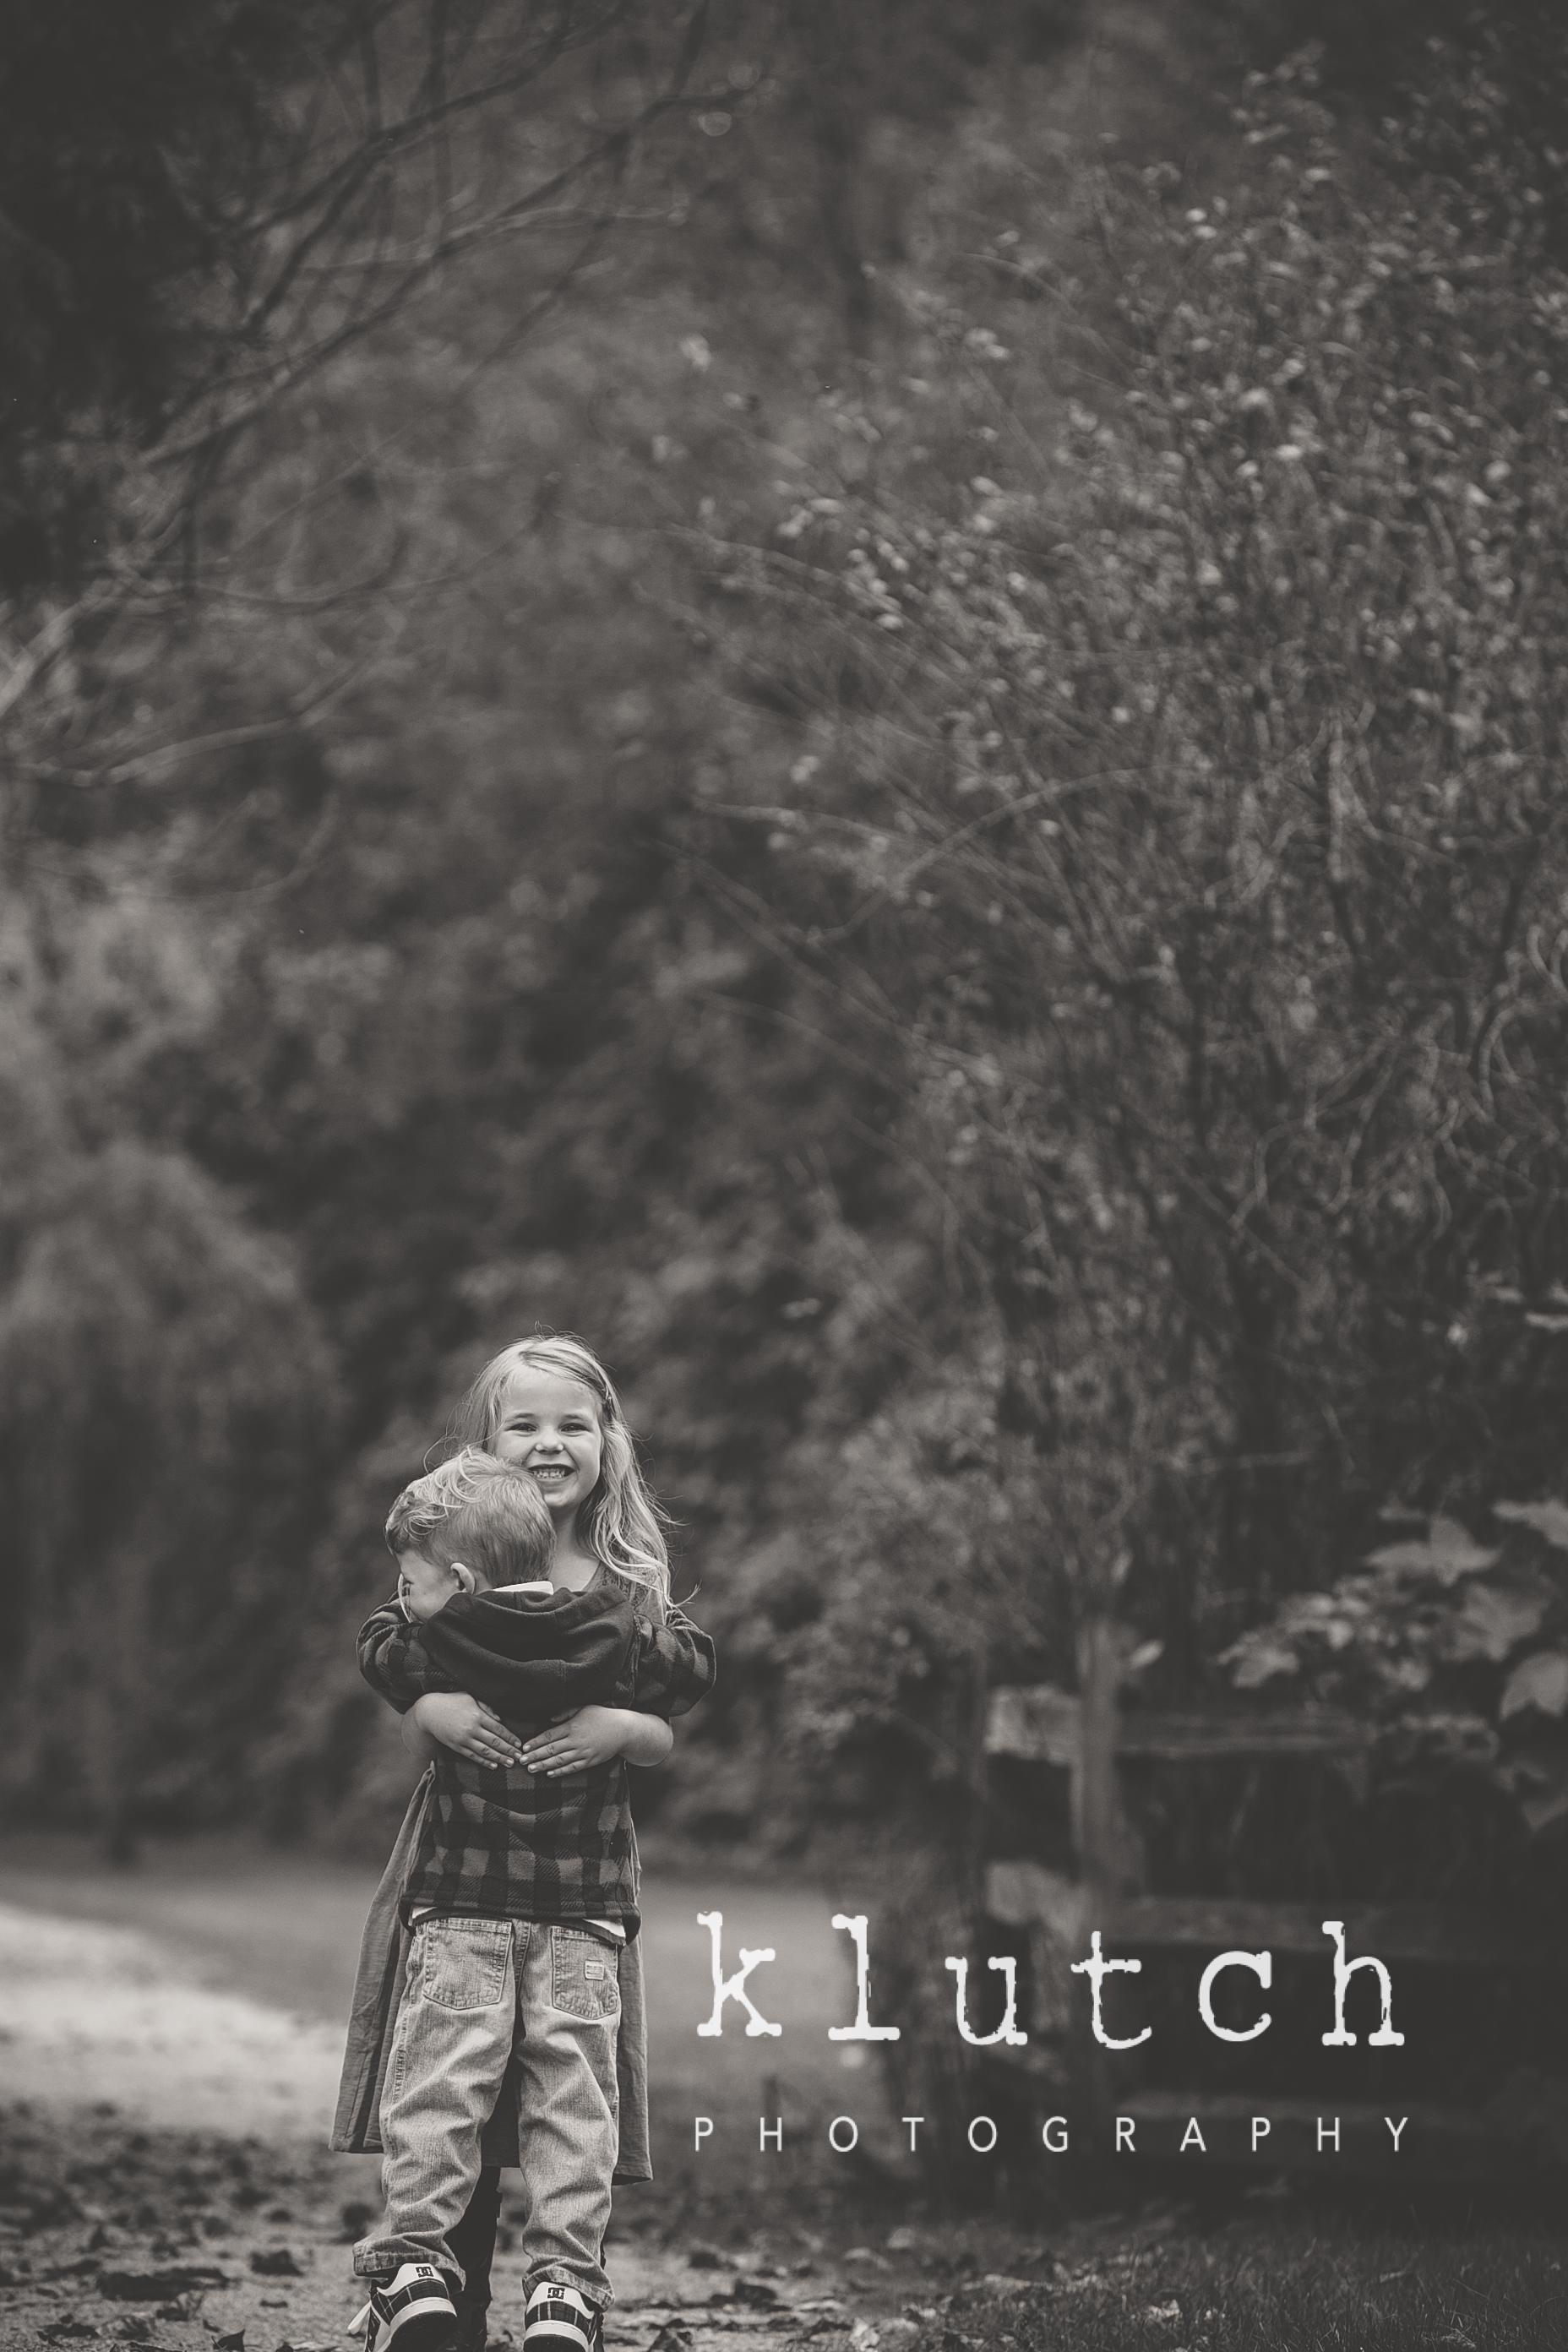 Klutch Photography,white rock family photographer, vancouver family photographer, whiterock lifestyle photographer, life unscripted photographer, life unscripted session, photography,Dina Ferreira Stoddard-41.jpg